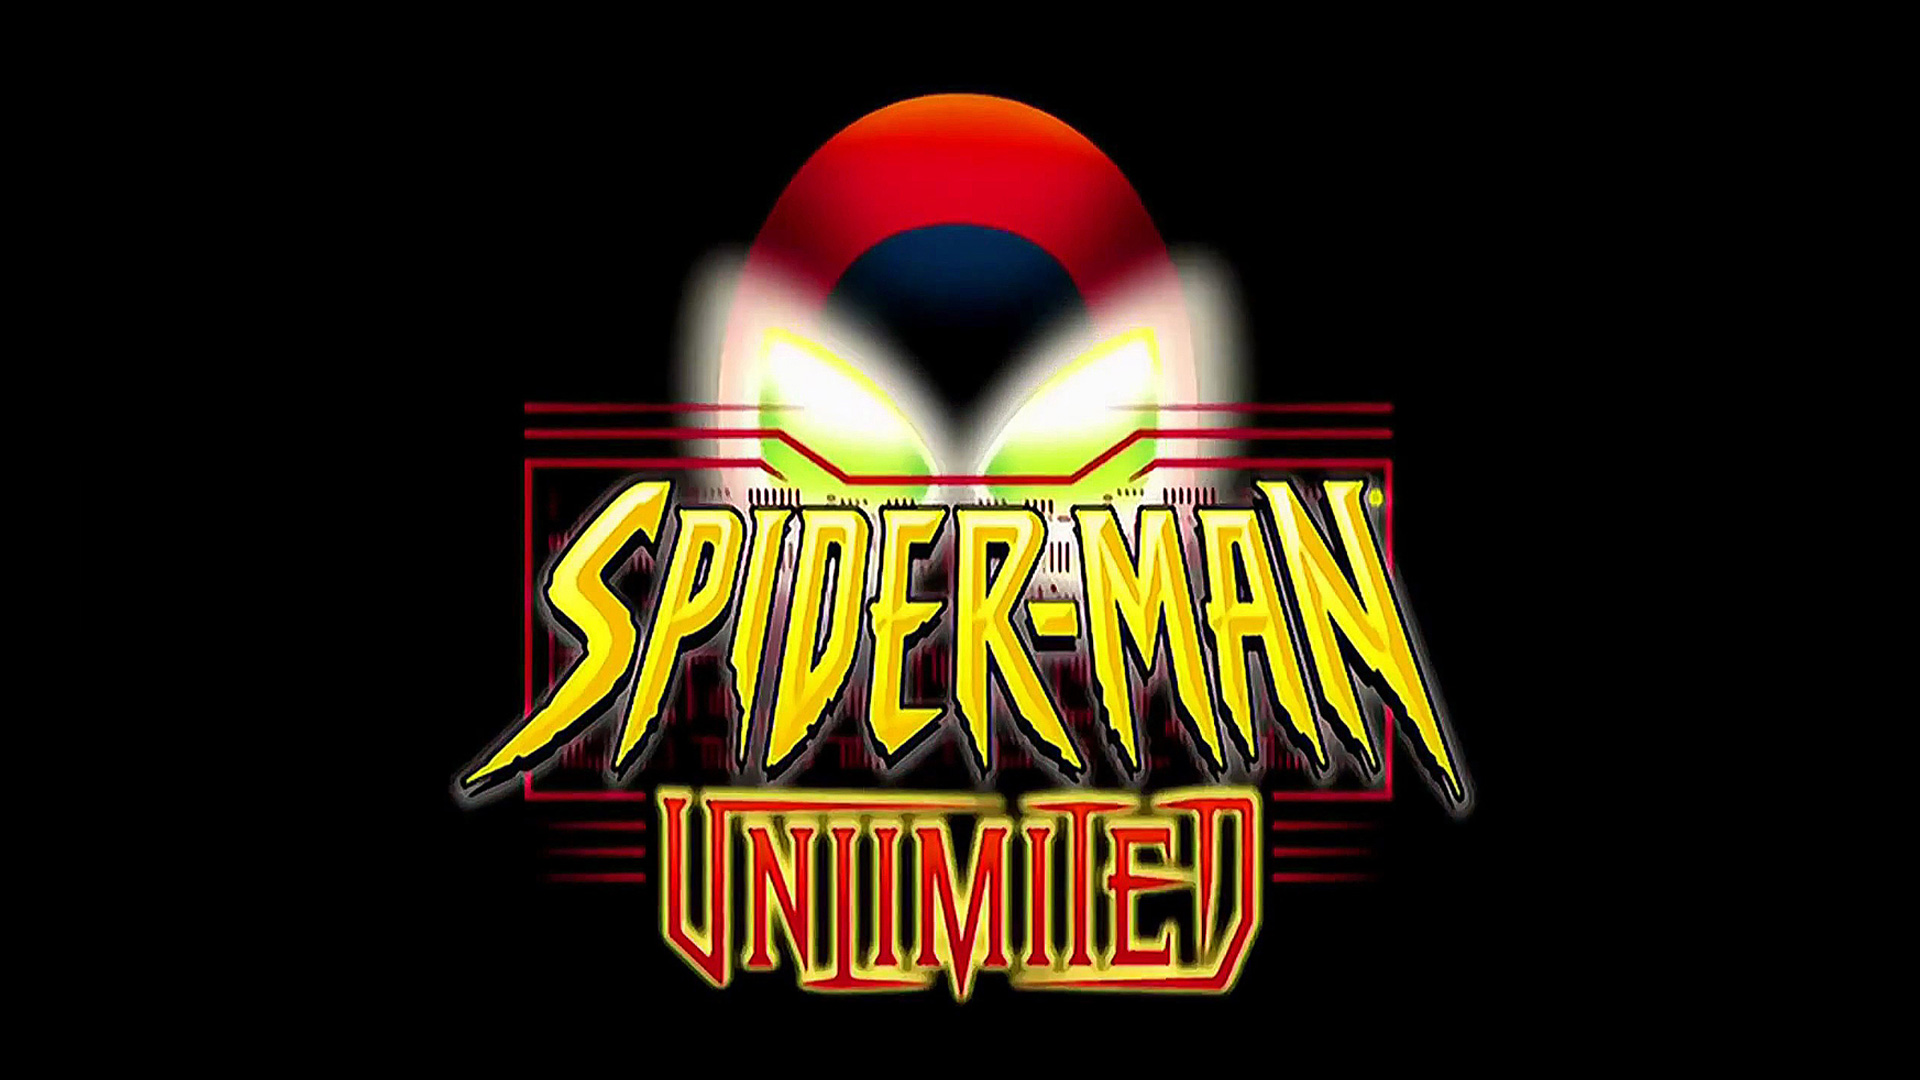 Spider-Man Unlimited Season 1